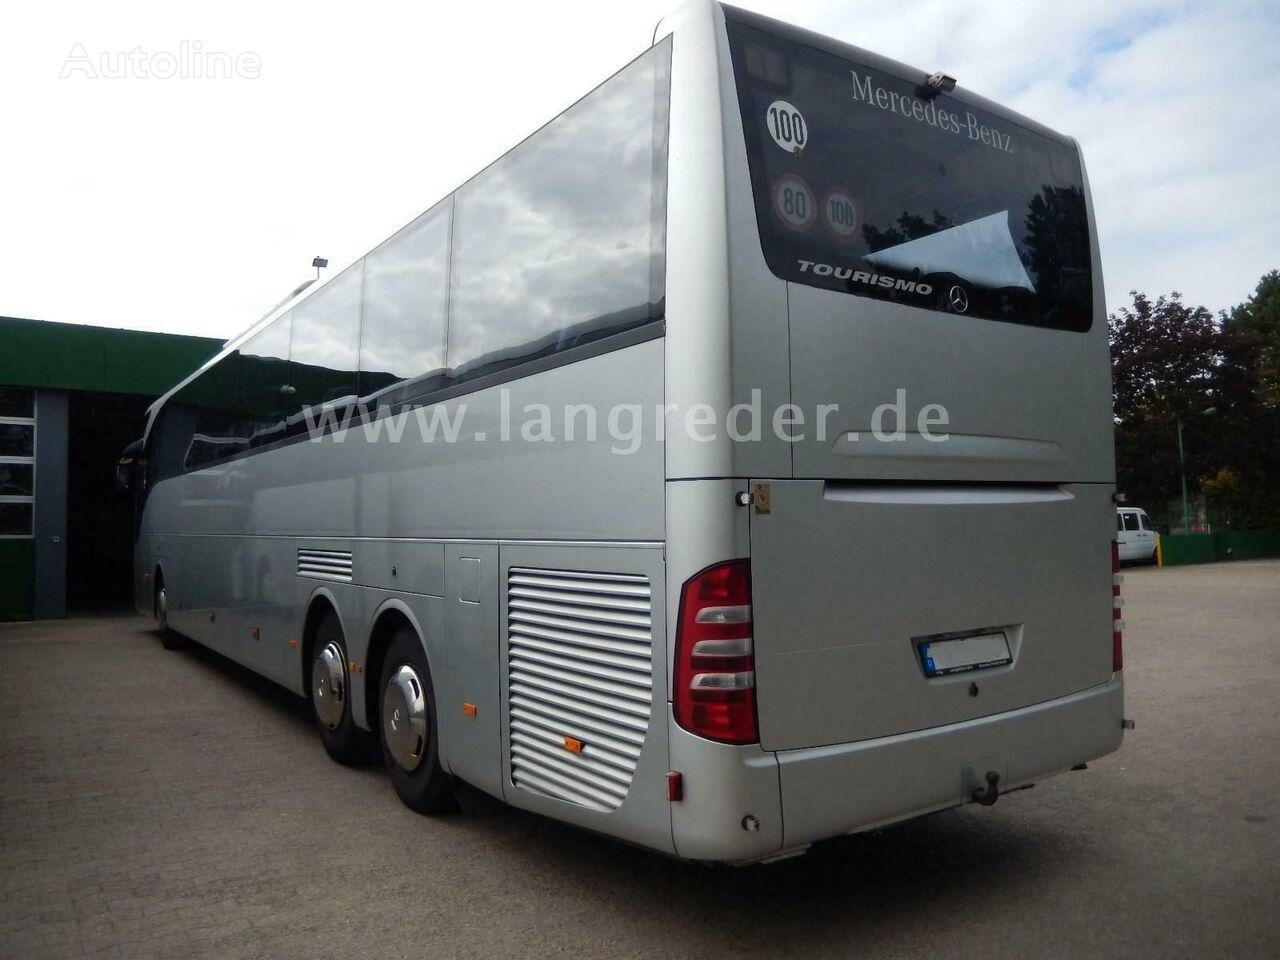 mercedes benz tourismo rhd l coach buses for sale tourist. Black Bedroom Furniture Sets. Home Design Ideas